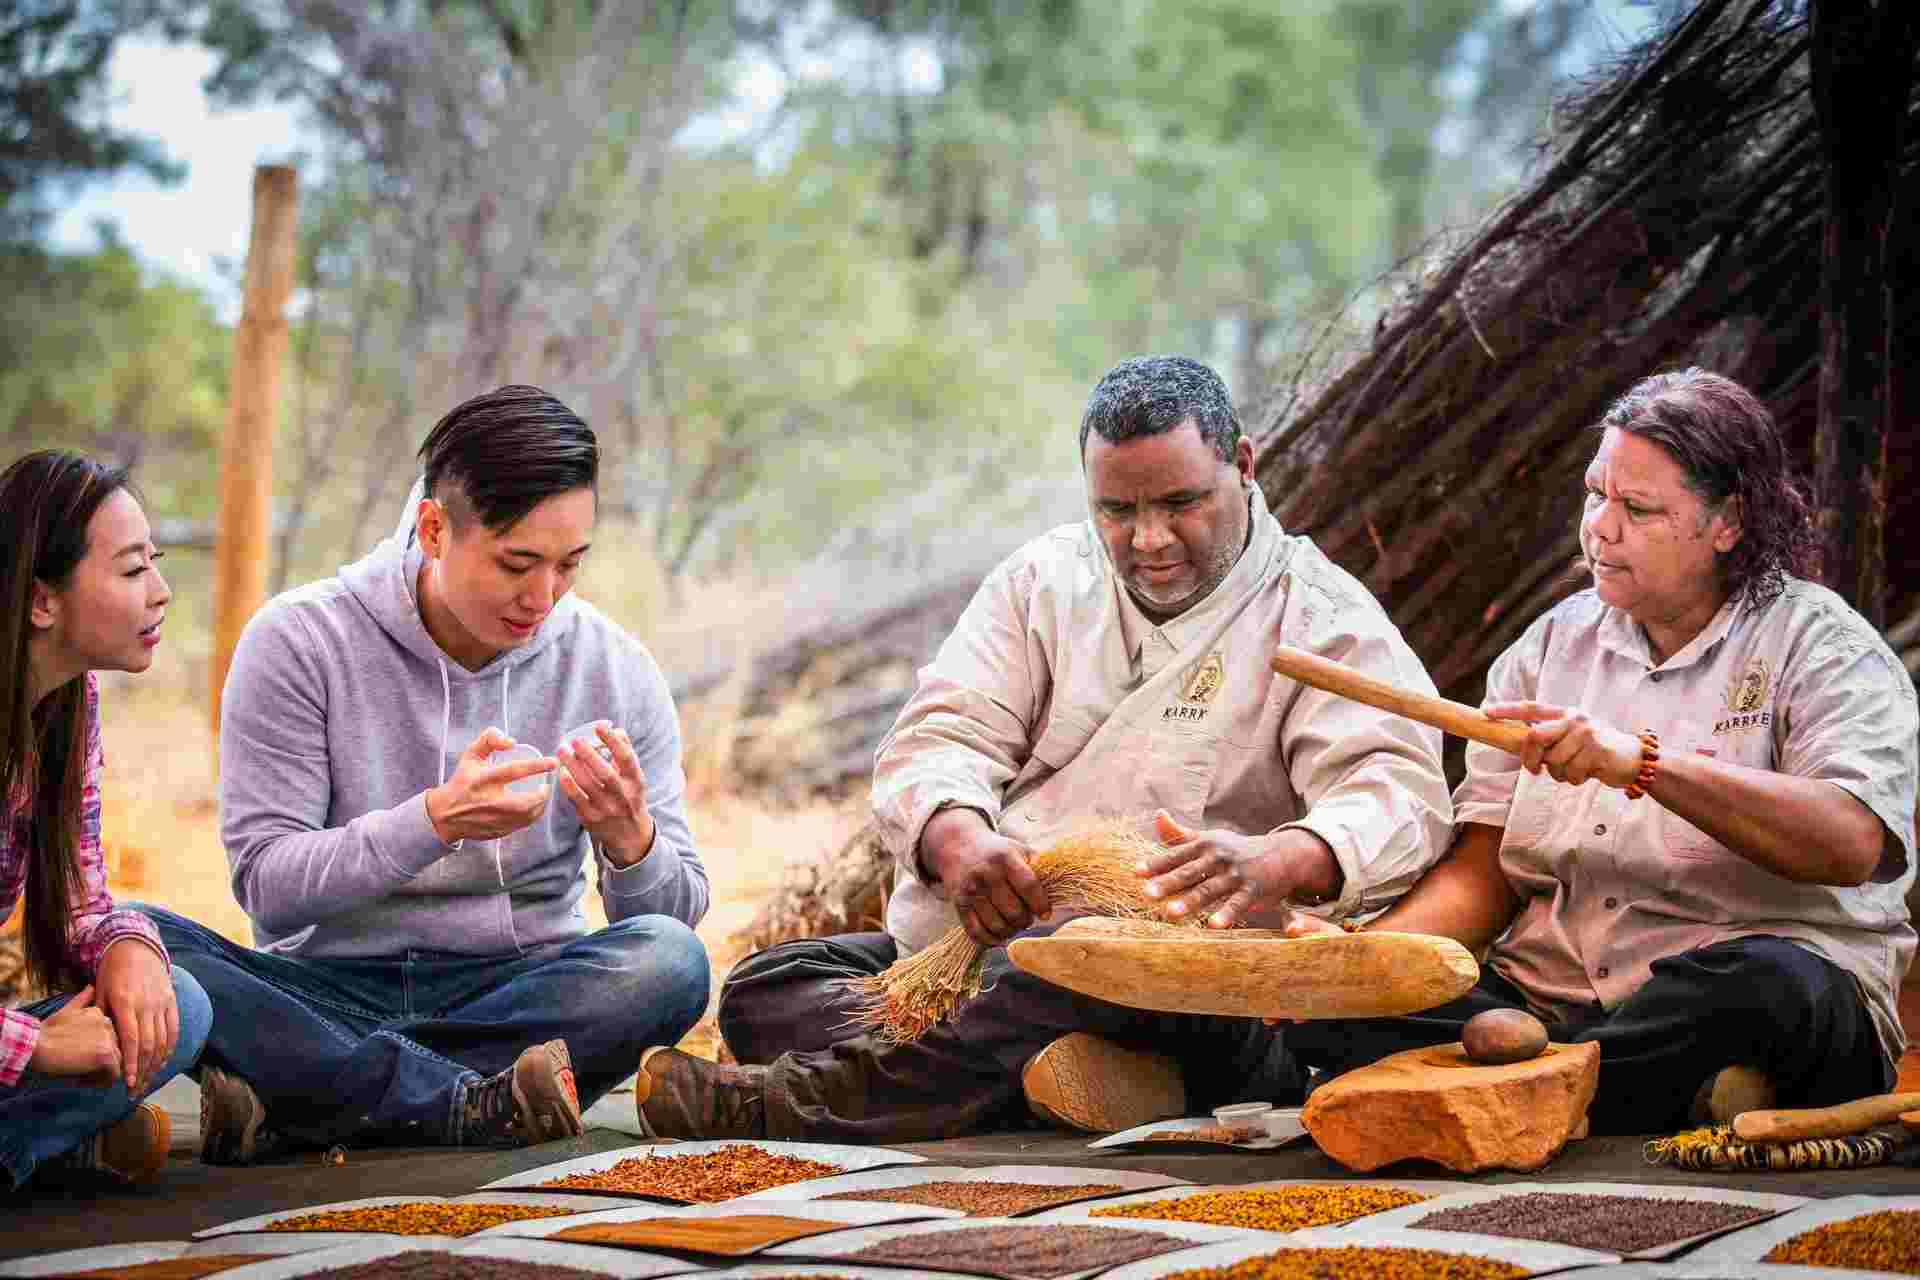 Karrke Aboriginal Cultural Experience & Tours